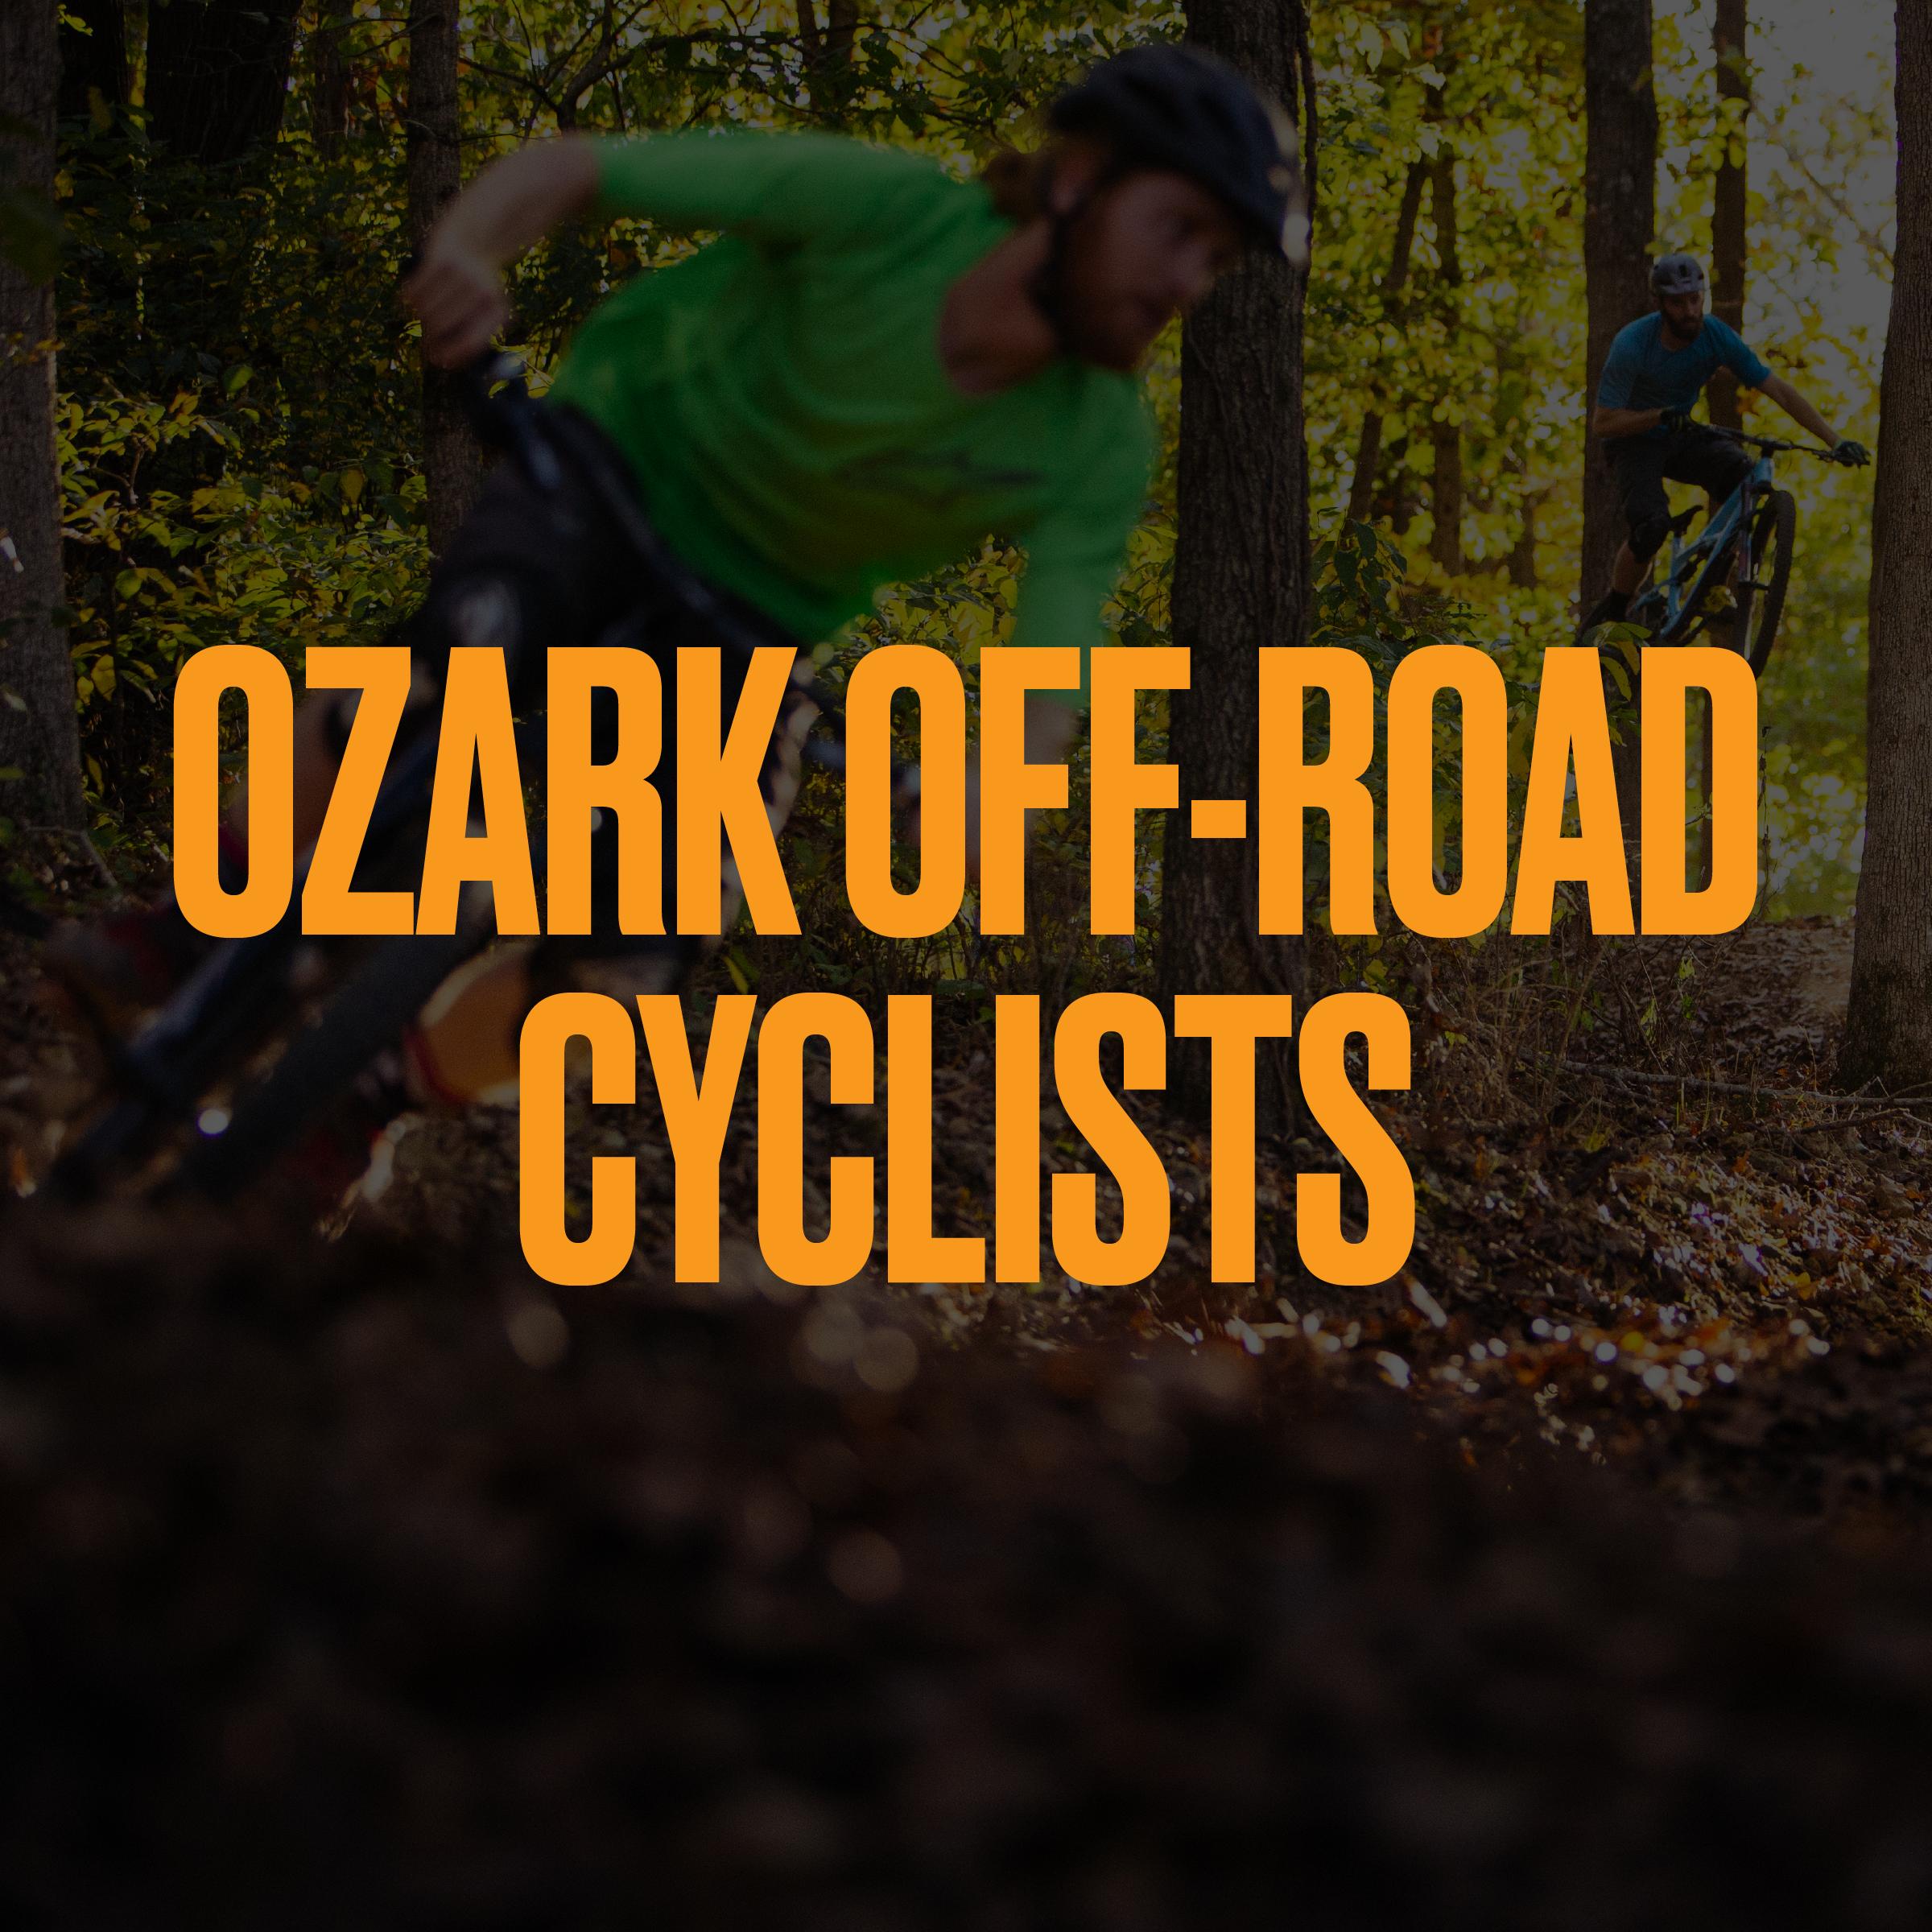 Ozark Off-Road Cyclists thumbnail.png